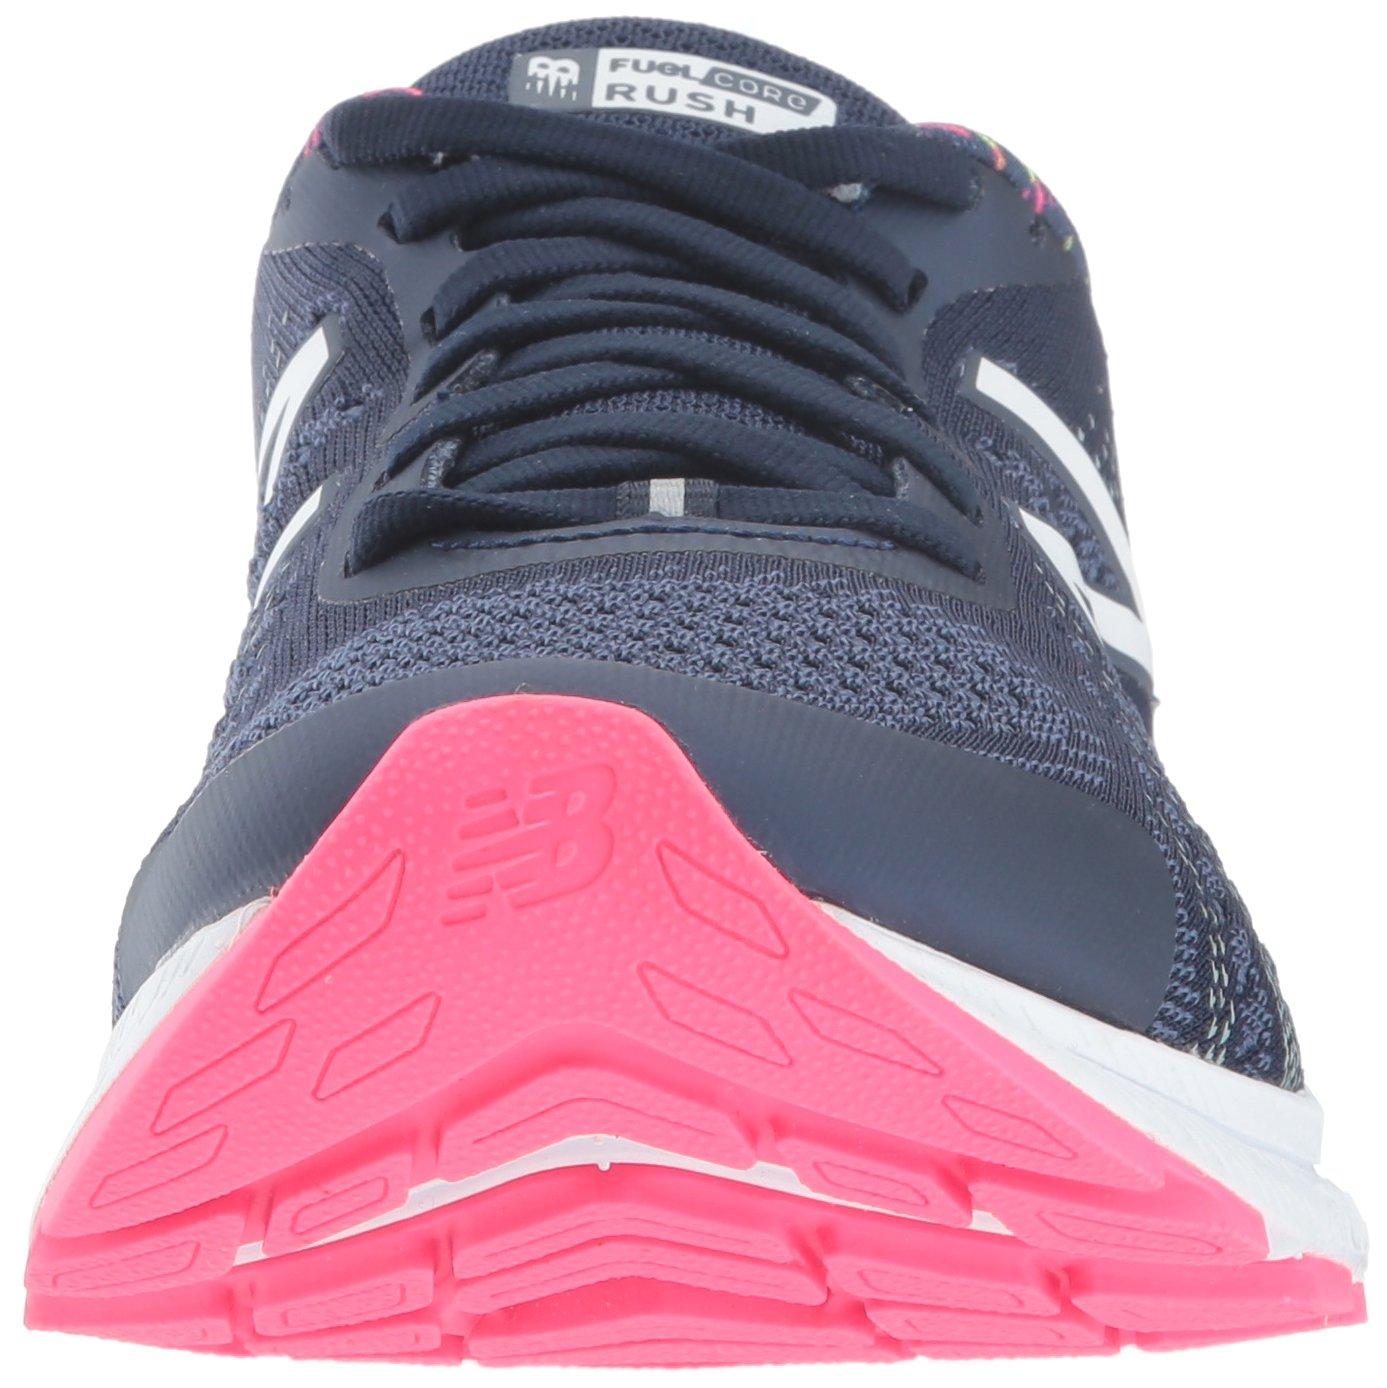 New Balance Women's Rushv3 Running-Shoes B01N43M9A0 6.5 B(M) US|Pigment/Alpha Pink